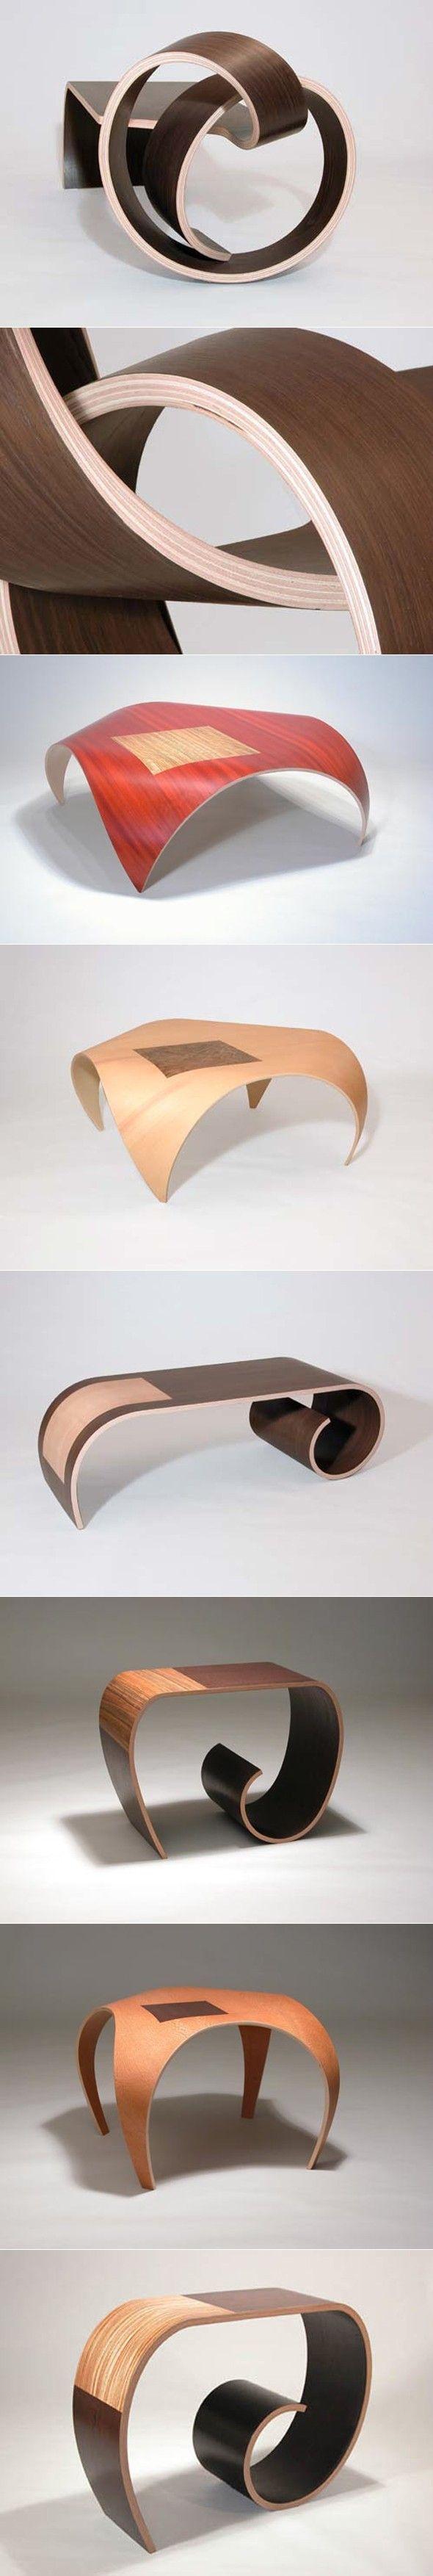 Kino Guérin présente la Why Knot Table - Journal du Design